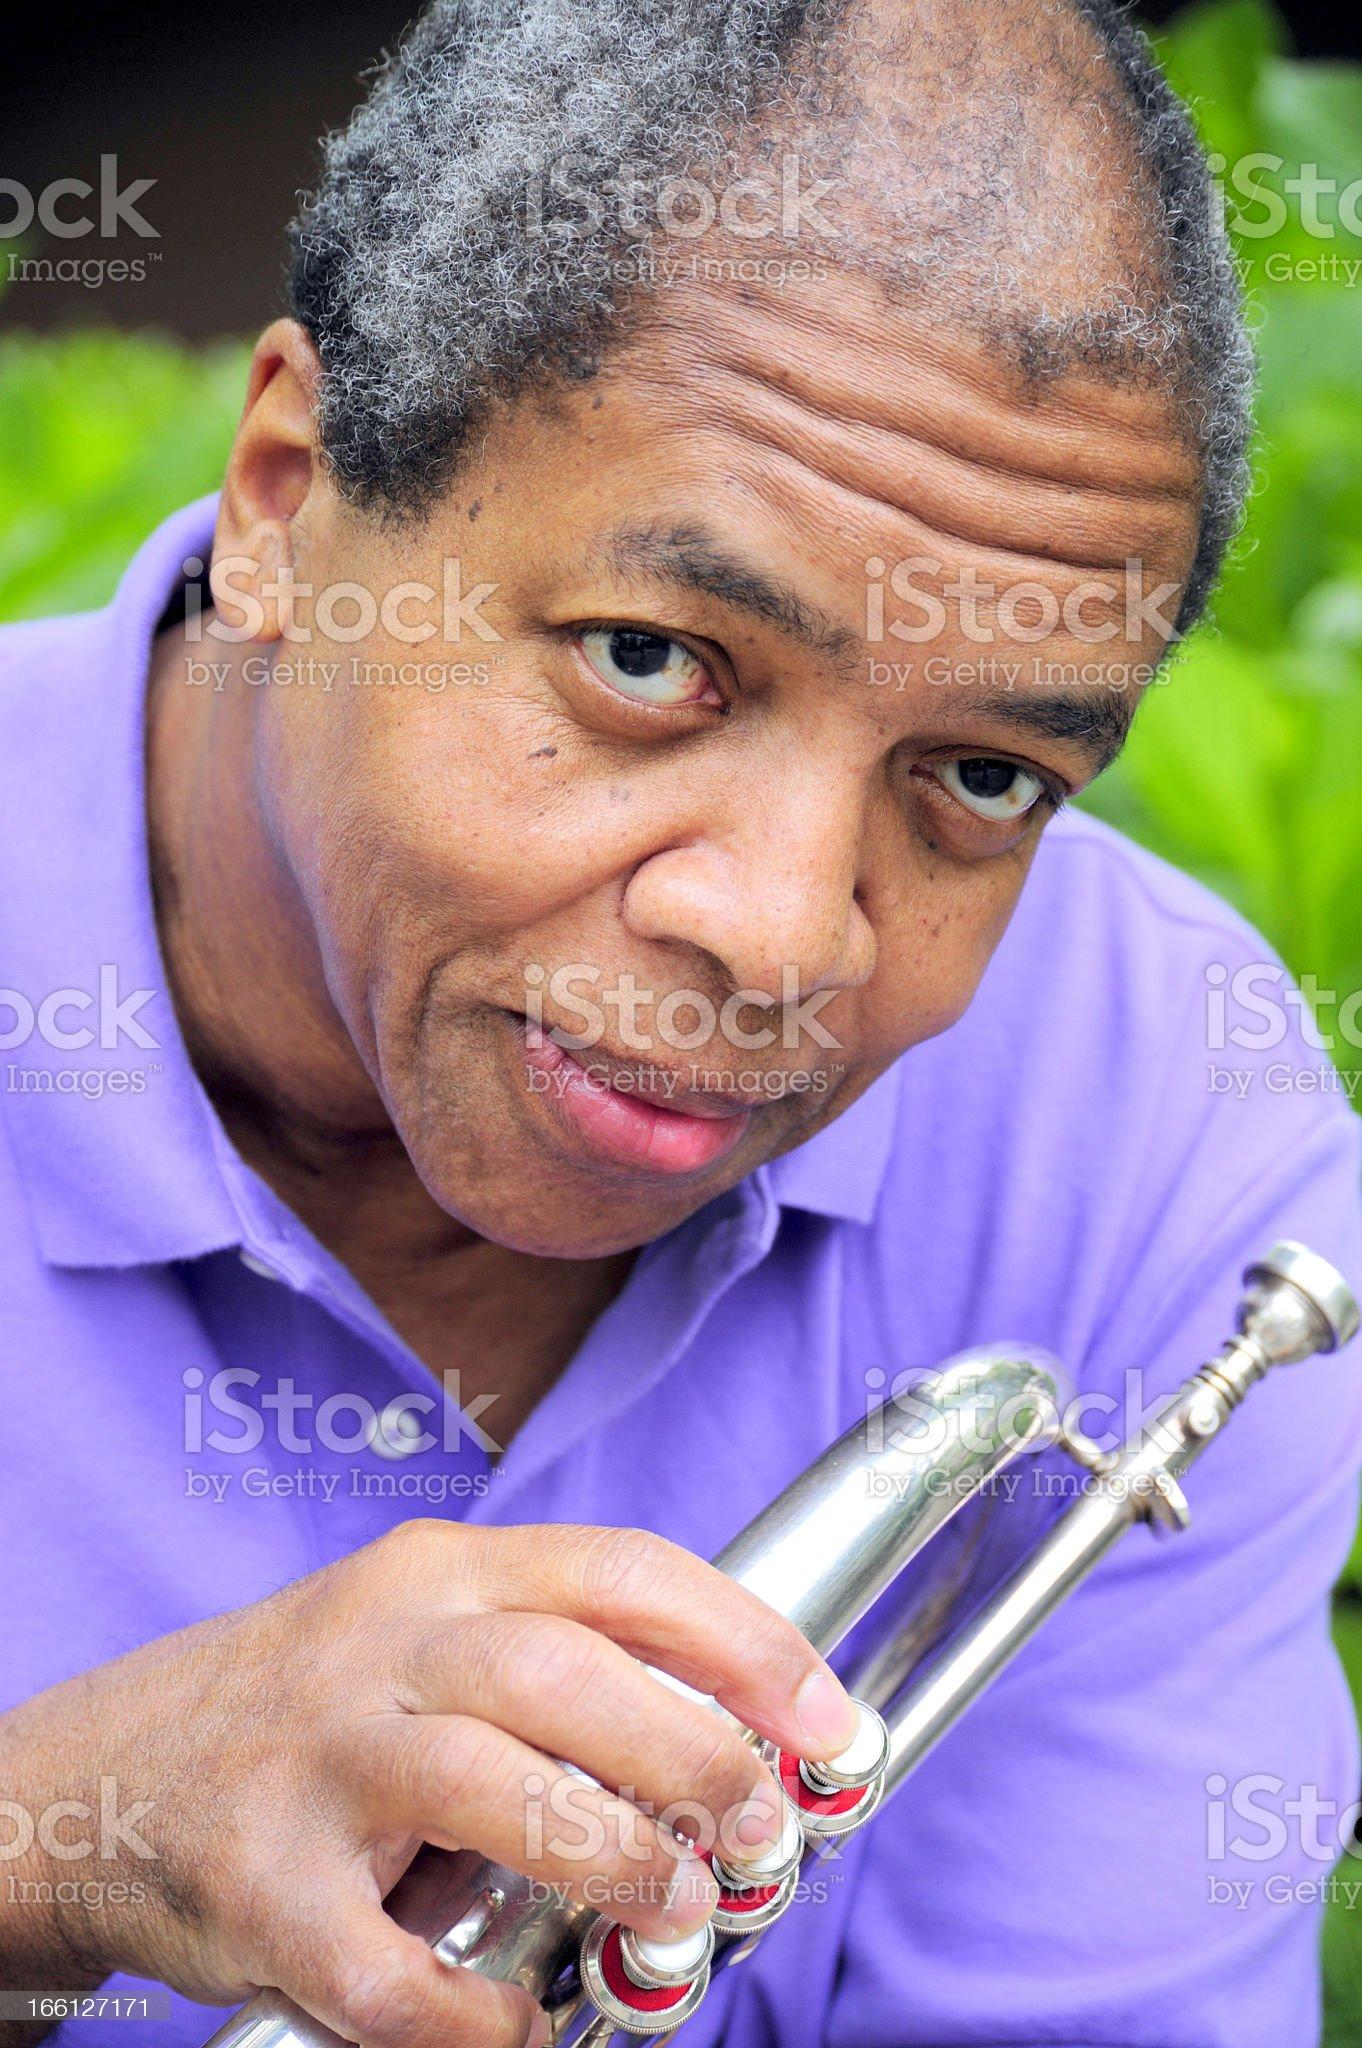 Jazz musician. royalty-free stock photo